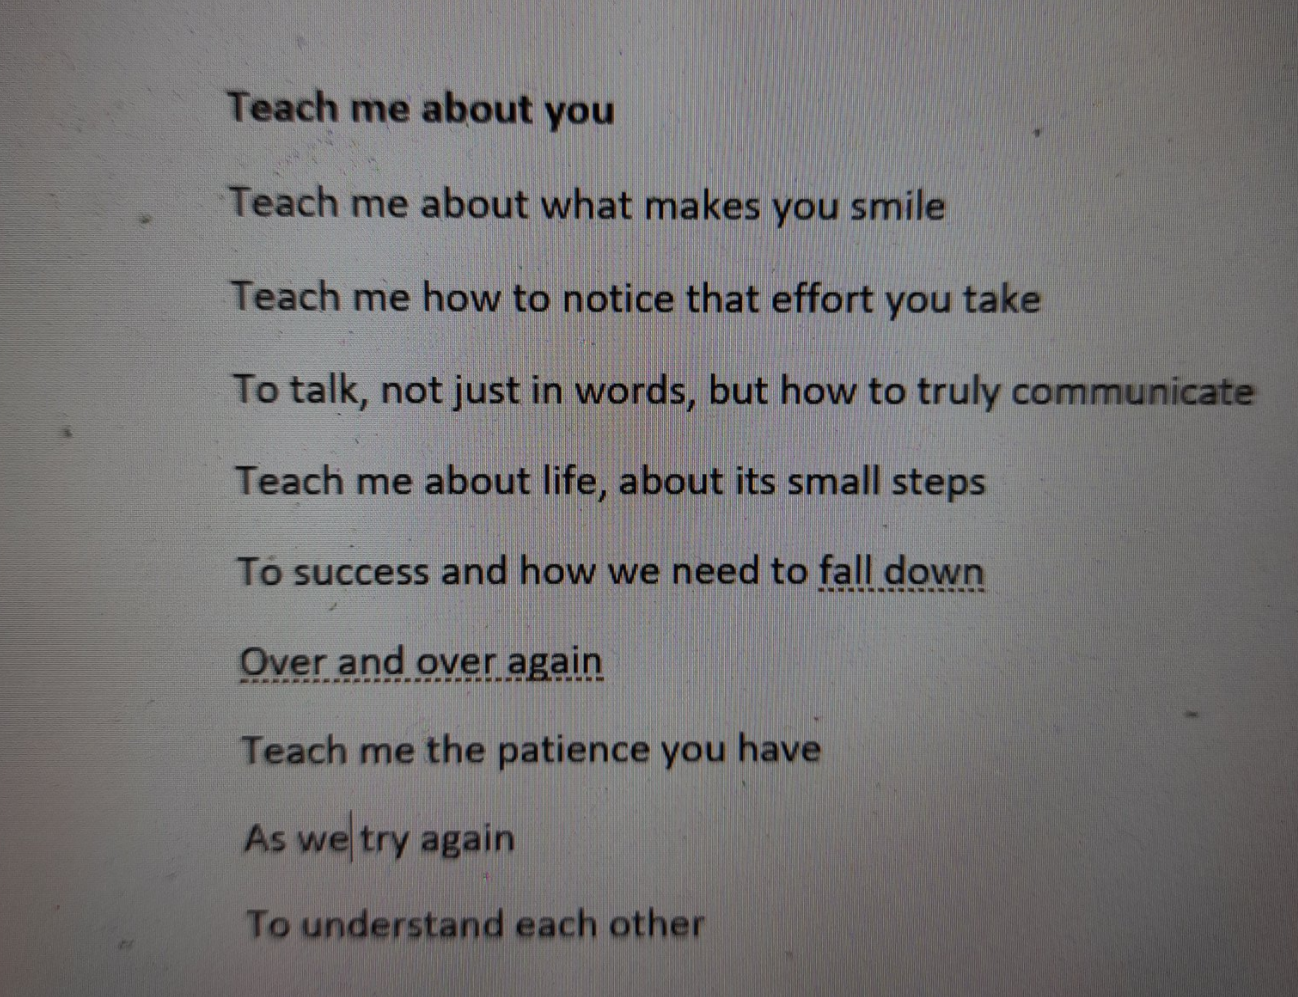 teach me about you by Brenna Farrow